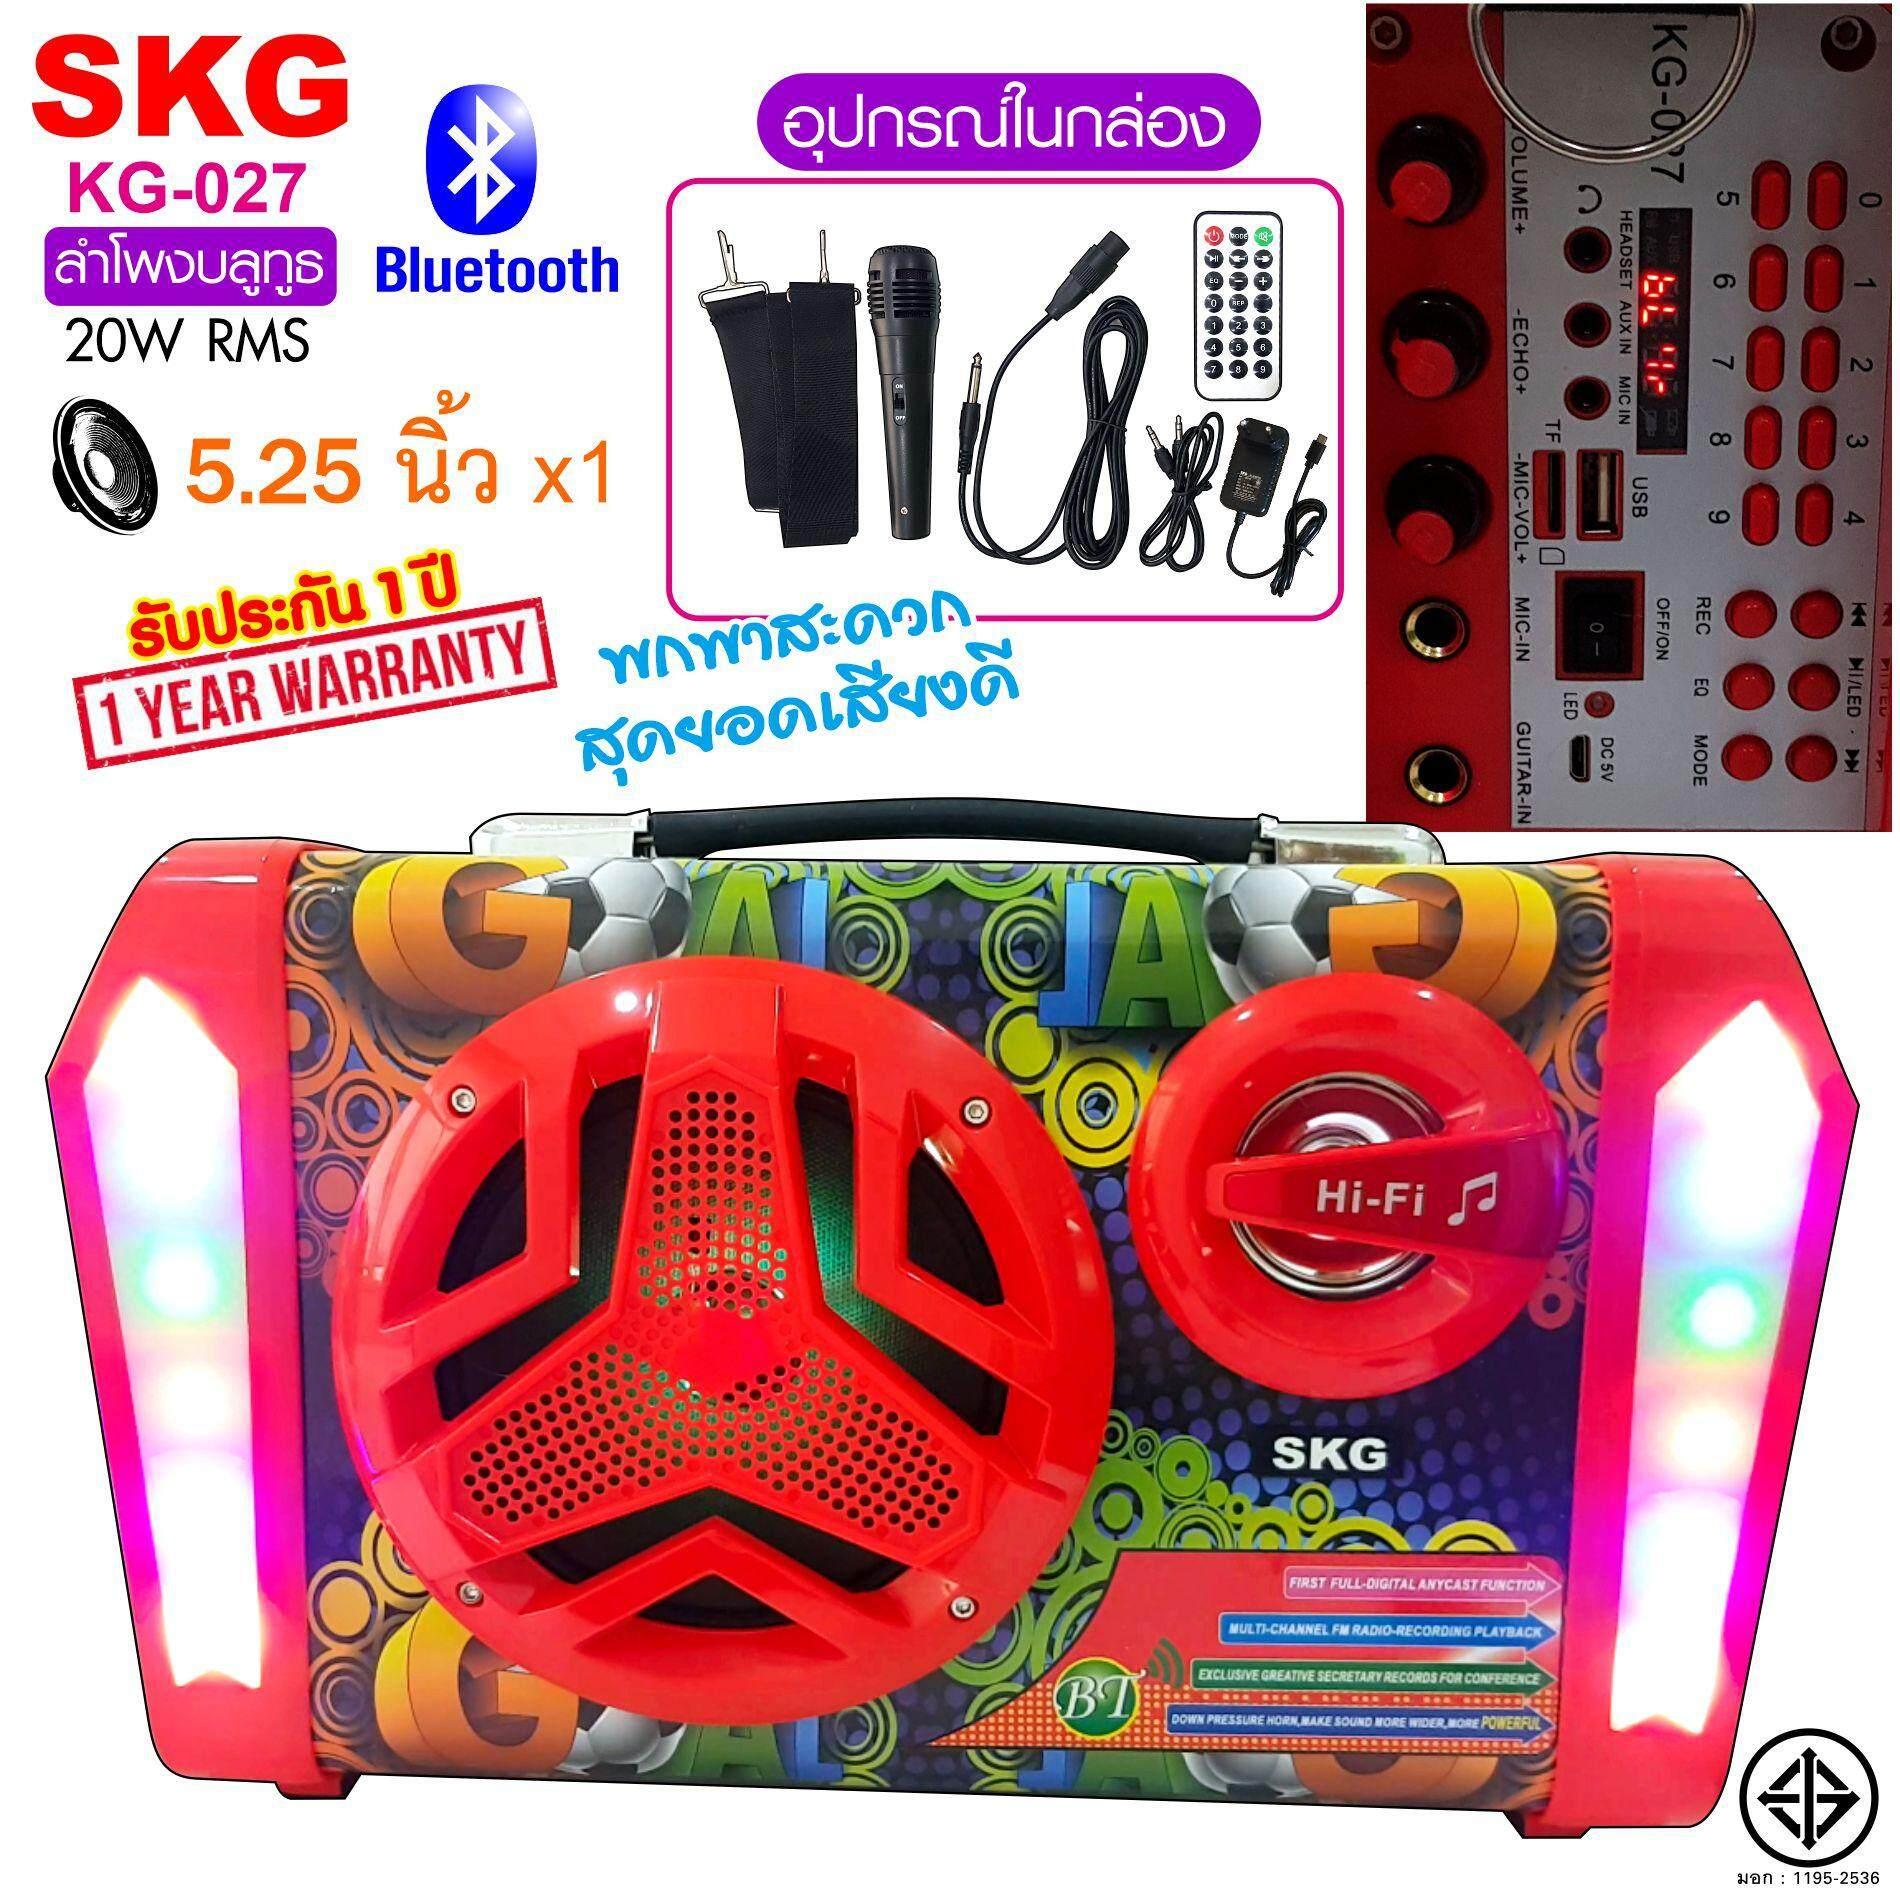 Skg ลำโพง Bluetooth พกพา เสียงดี 5.25นิ้ว รุ่น Kg-027.